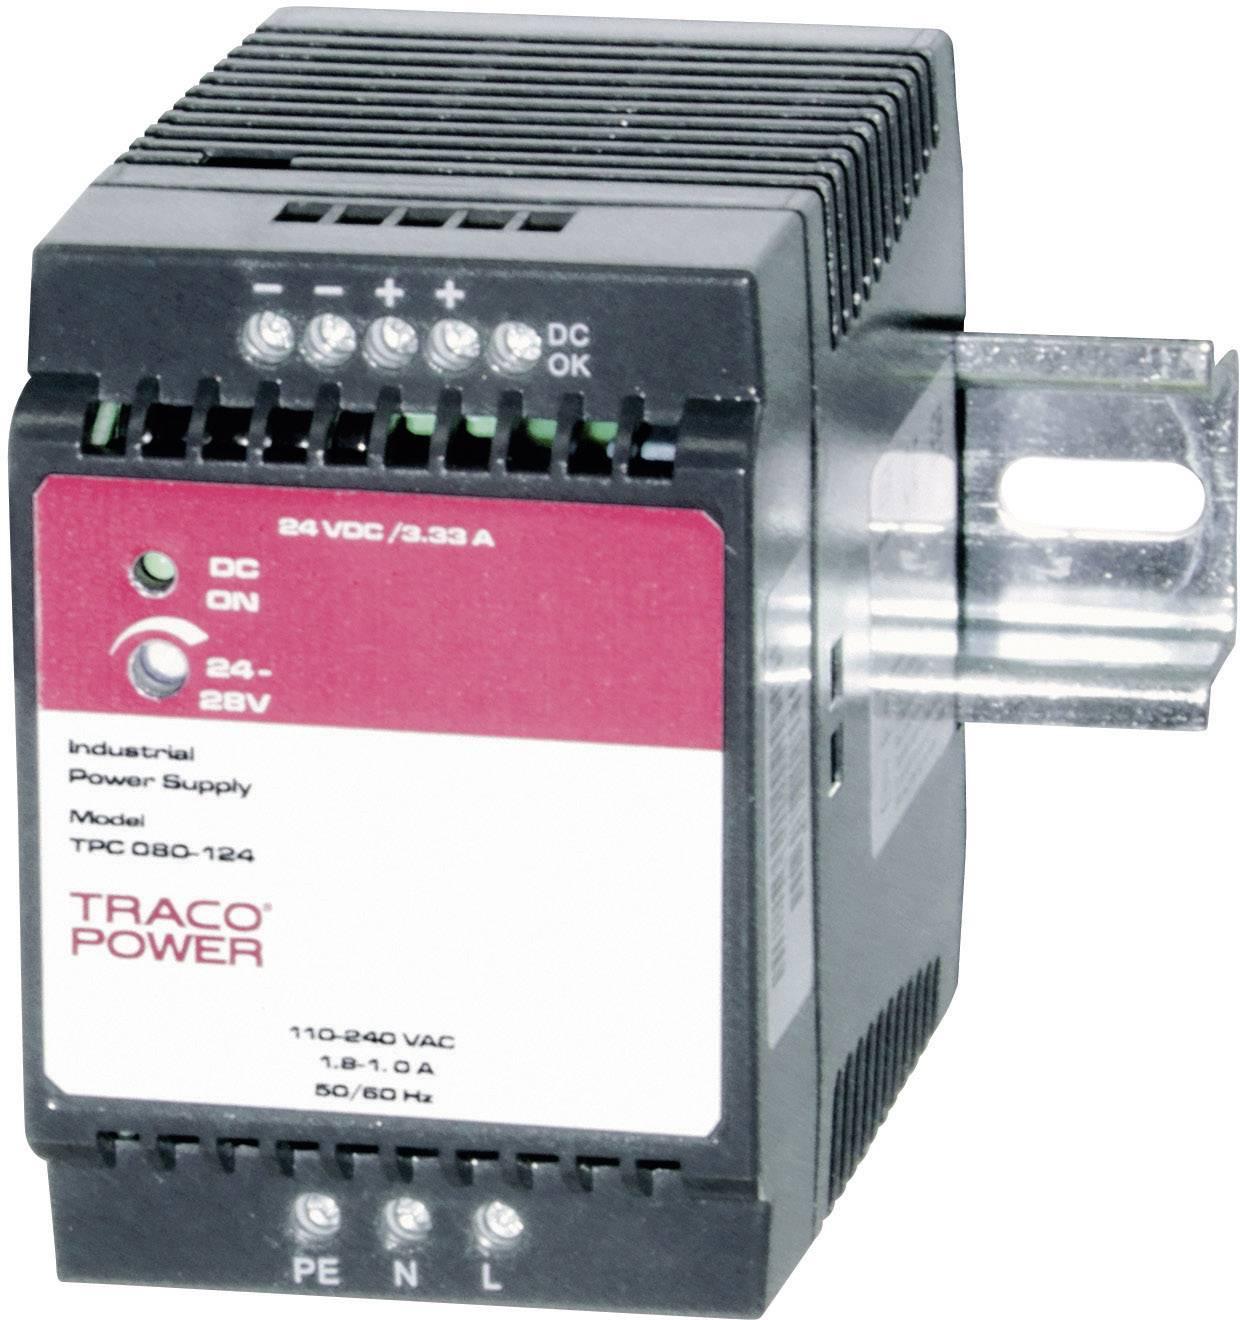 Zdroj na DIN lištu TracoPower TPC 080-112, 12 - 15 V/DC, 6 A